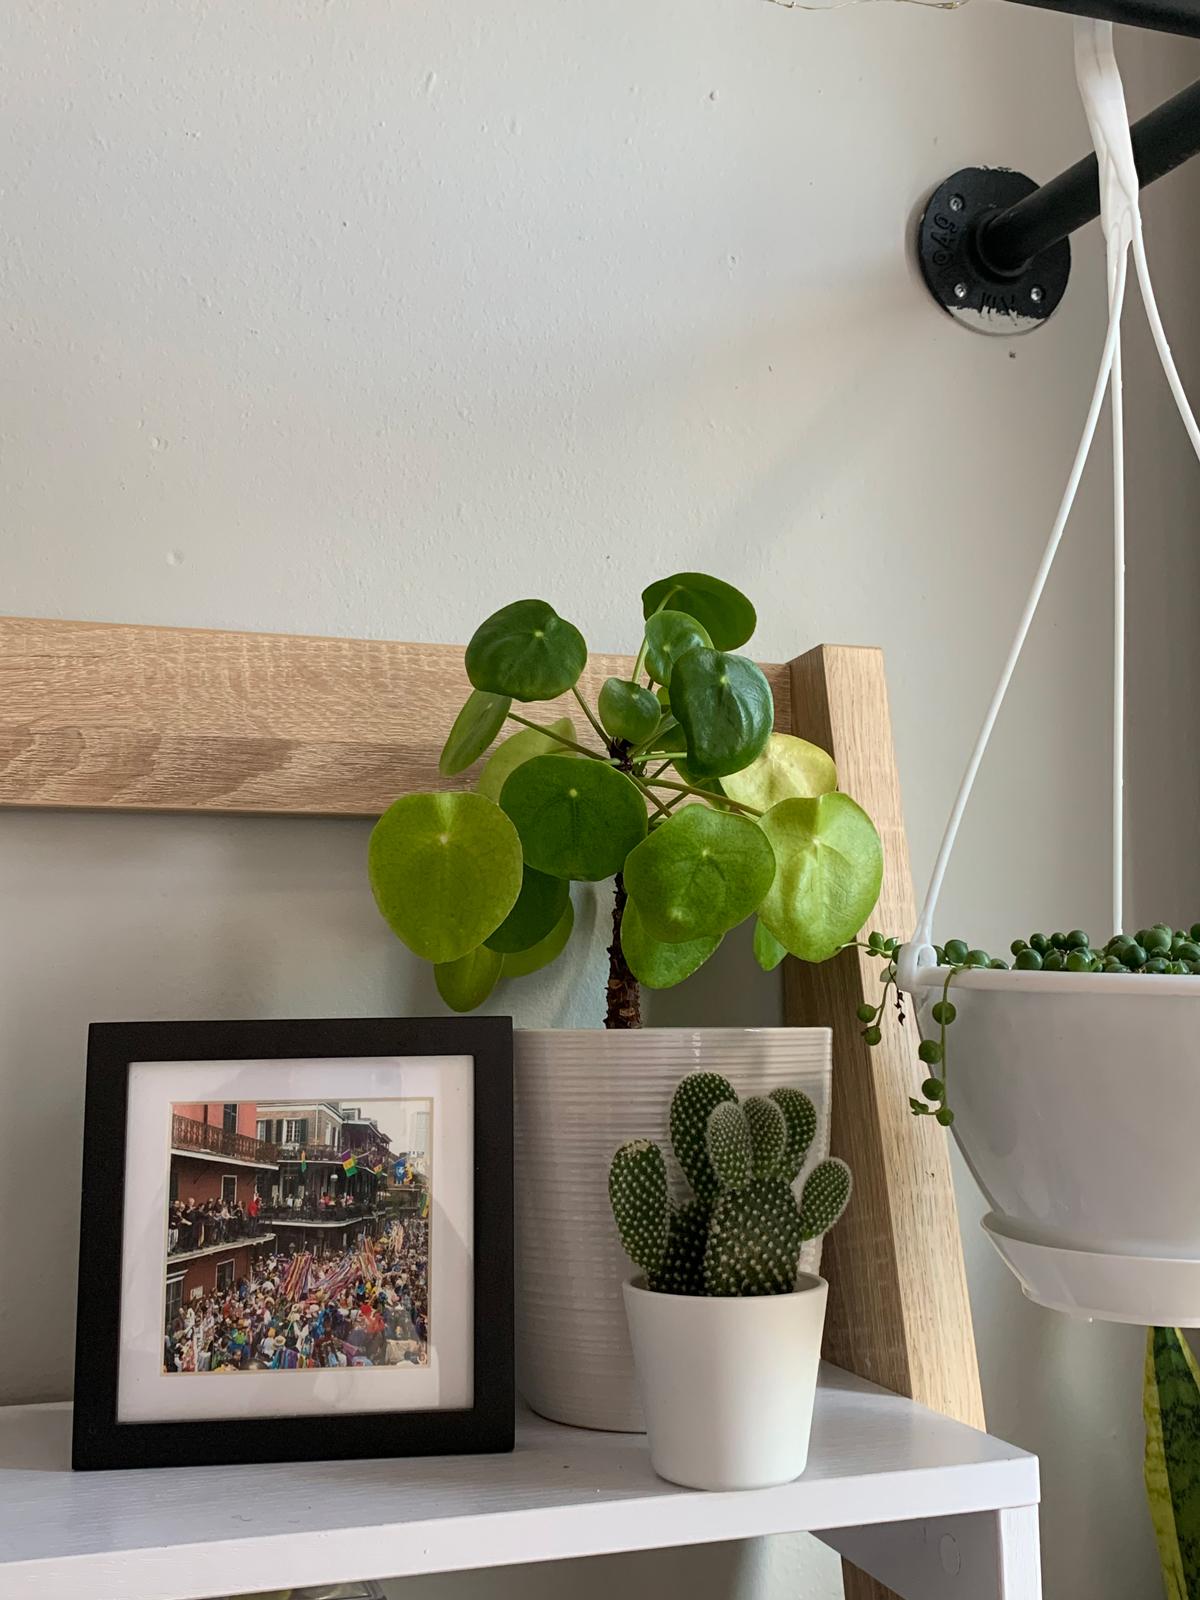 Photo frame on shelf next to potted plants